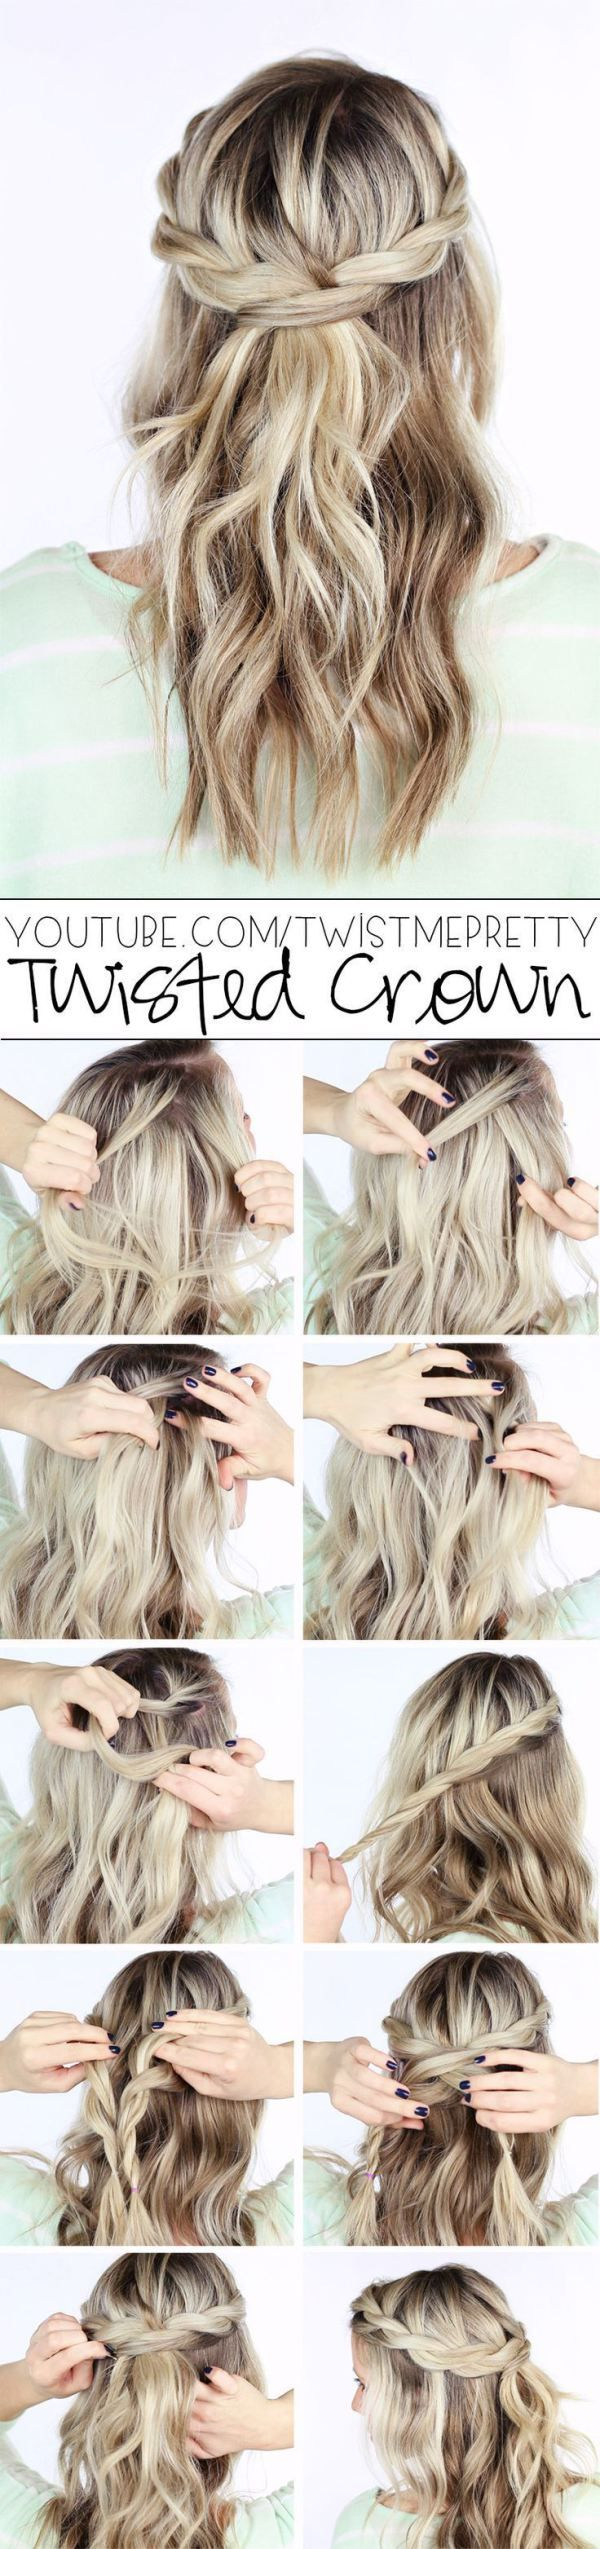 Brilliant 1000 Ideas About Braided Half Up On Pinterest Half Up Half Up Short Hairstyles For Black Women Fulllsitofus